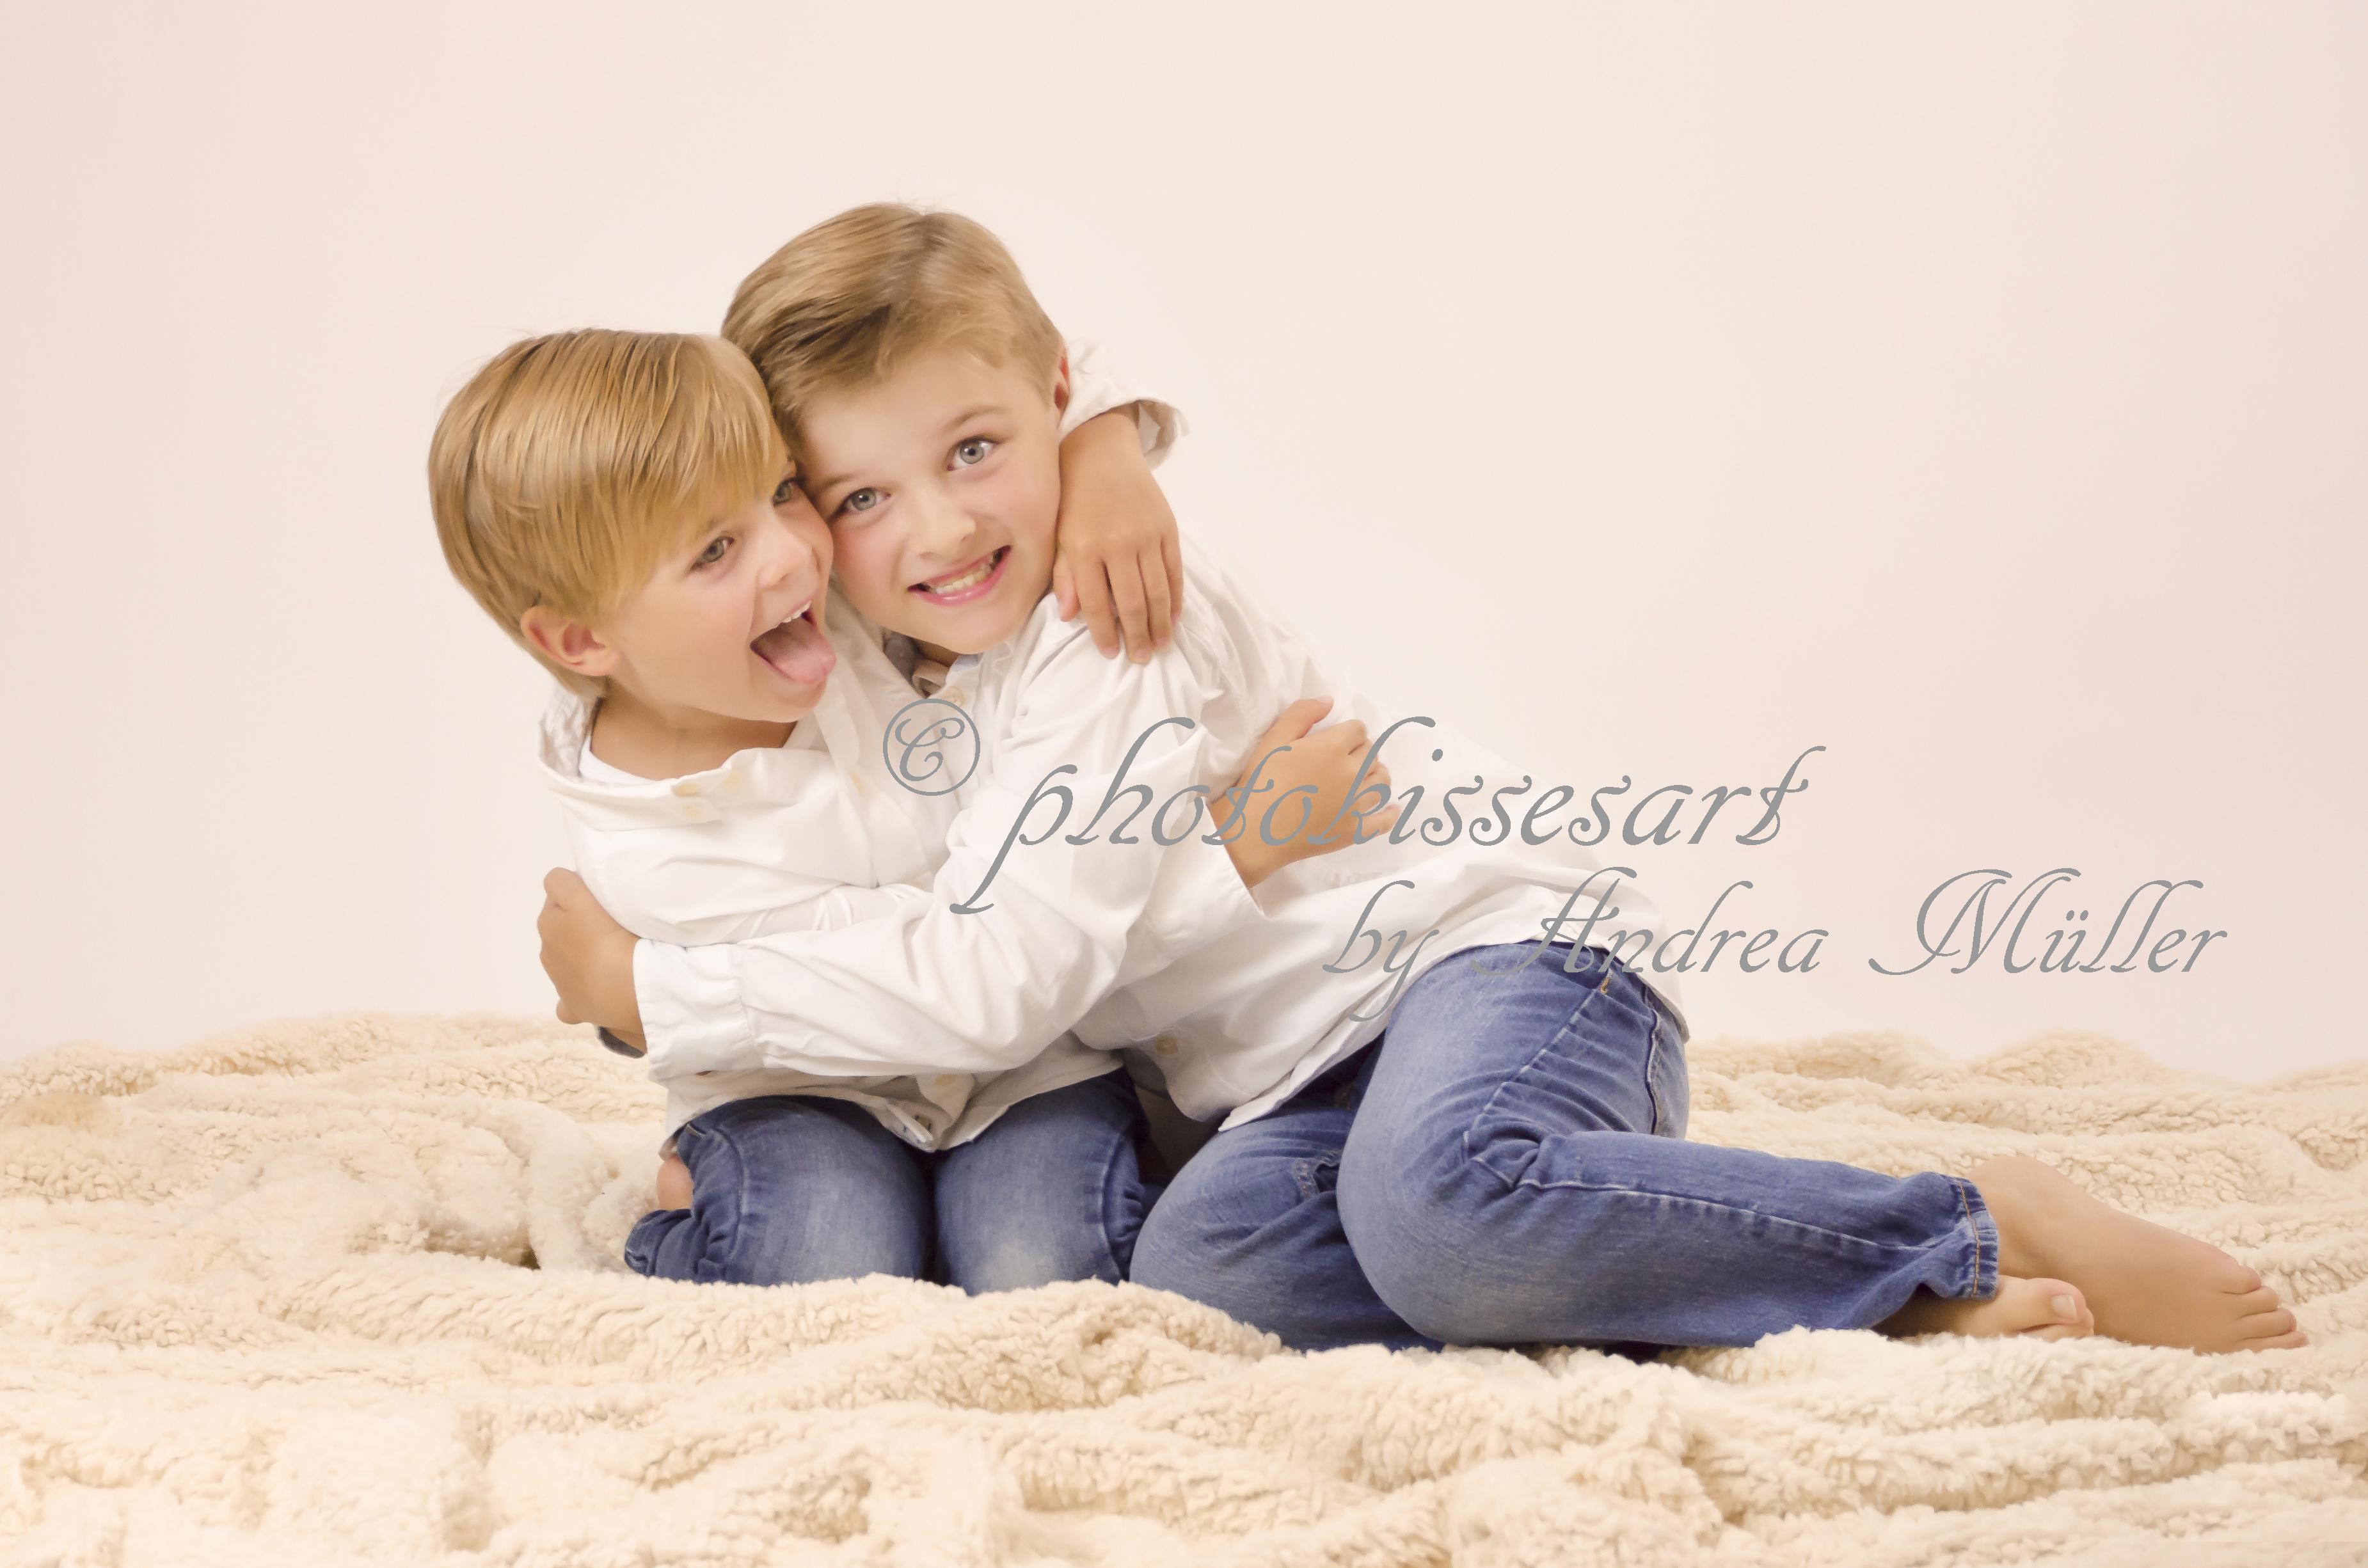 Kinderfotos Langenfeld photokissesart Mueller (12).jpg